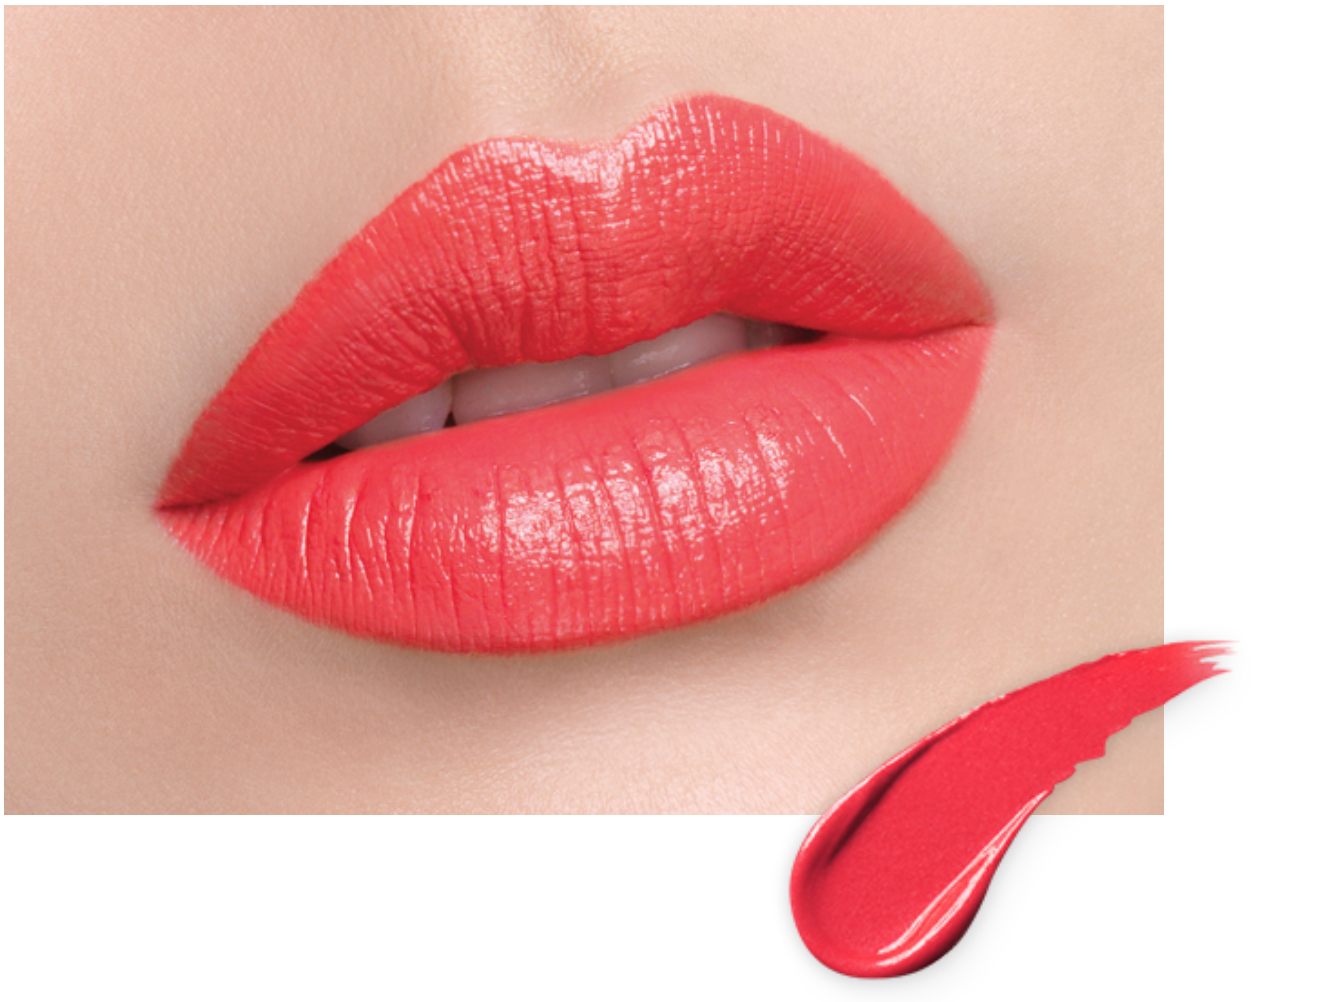 laneige-silk-intense-lipstick-238.png